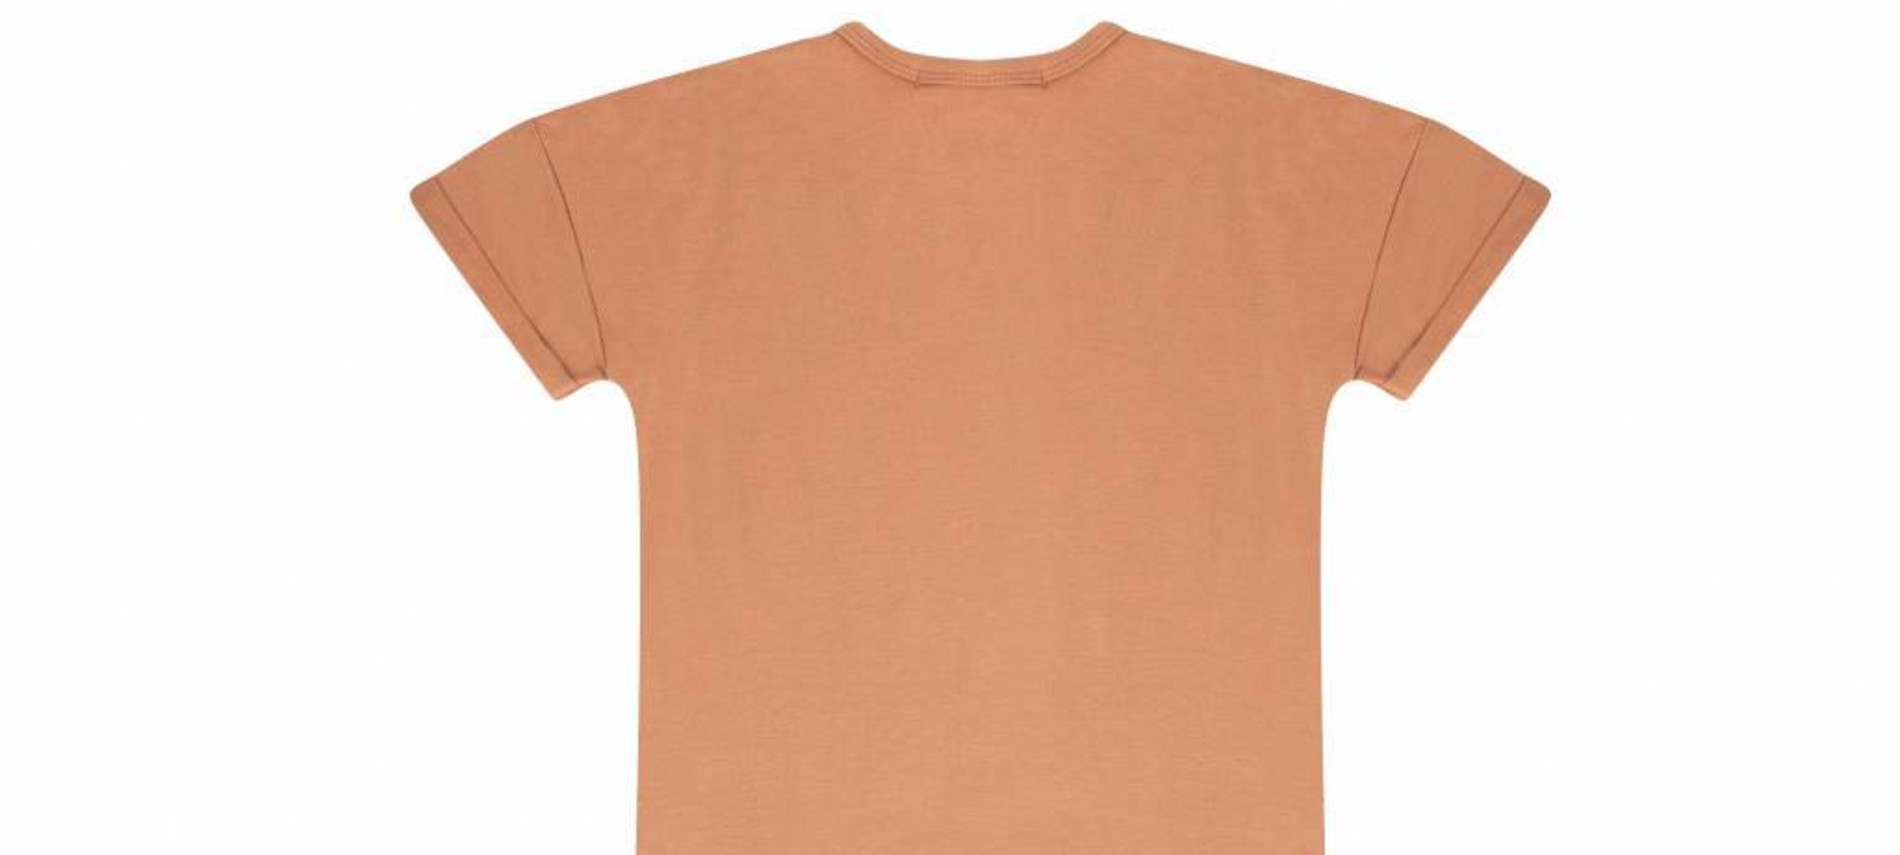 T-shirt dress toasted nut